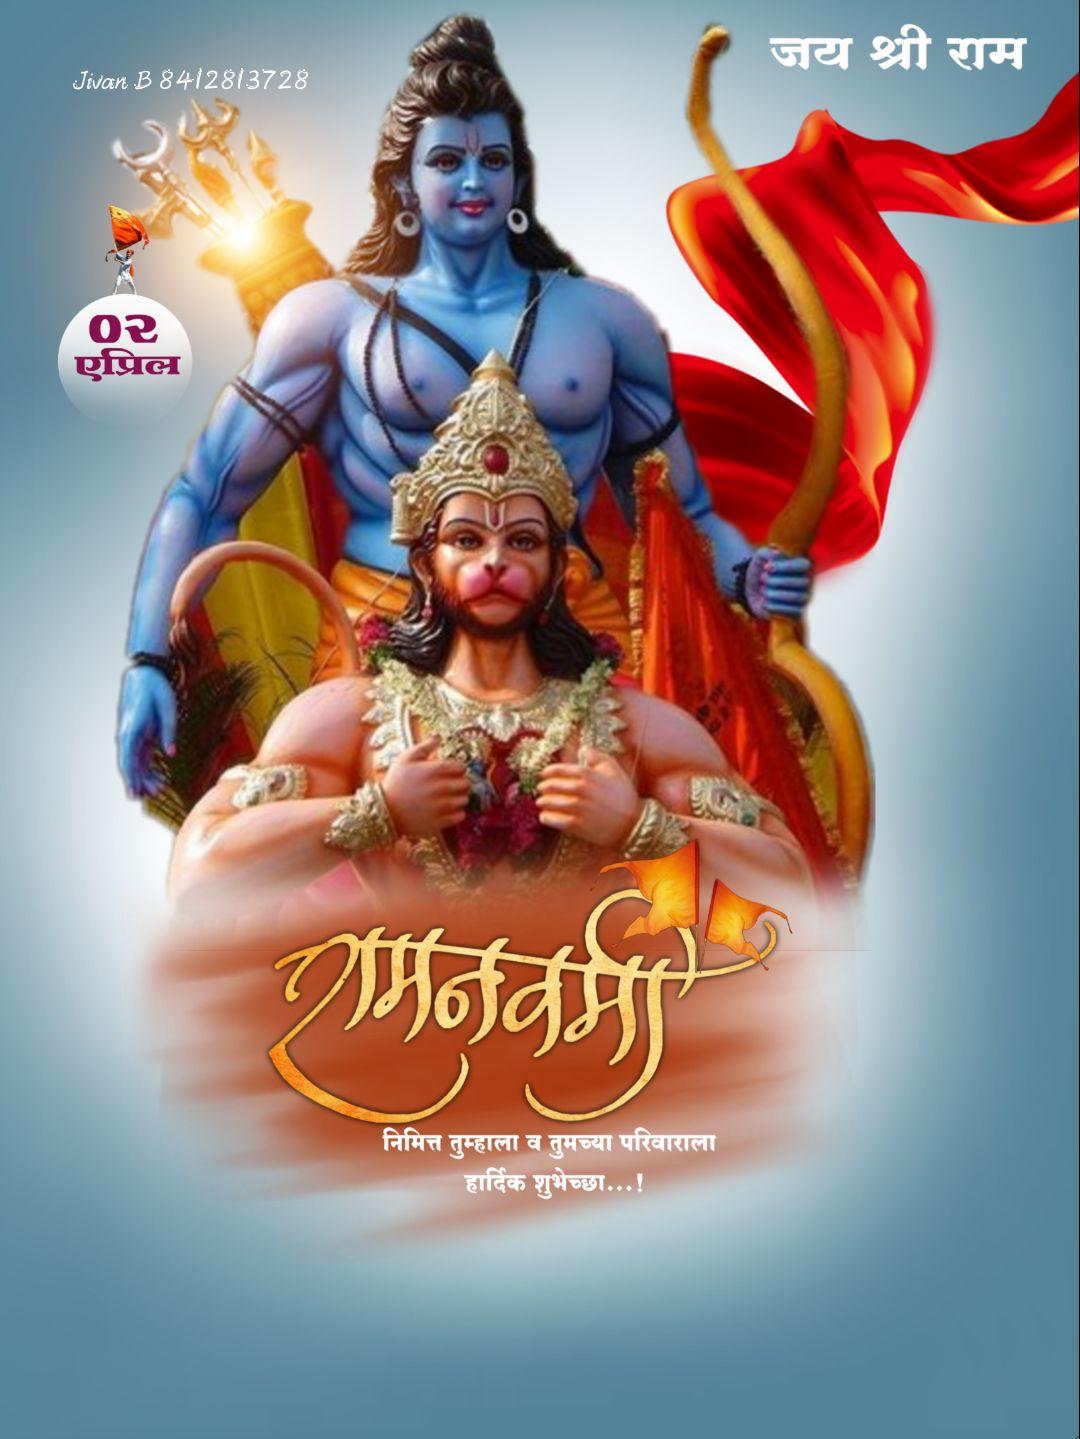 🙏श्री राम नवमी शुभेच्छा - जय श्री राम Jivan B 8412813728 ०२ एप्रिल मनवमा निमित्त तुम्हाला व तुमच्या परिवाराला हार्दिक शुभेच्छा . . . ! - ShareChat